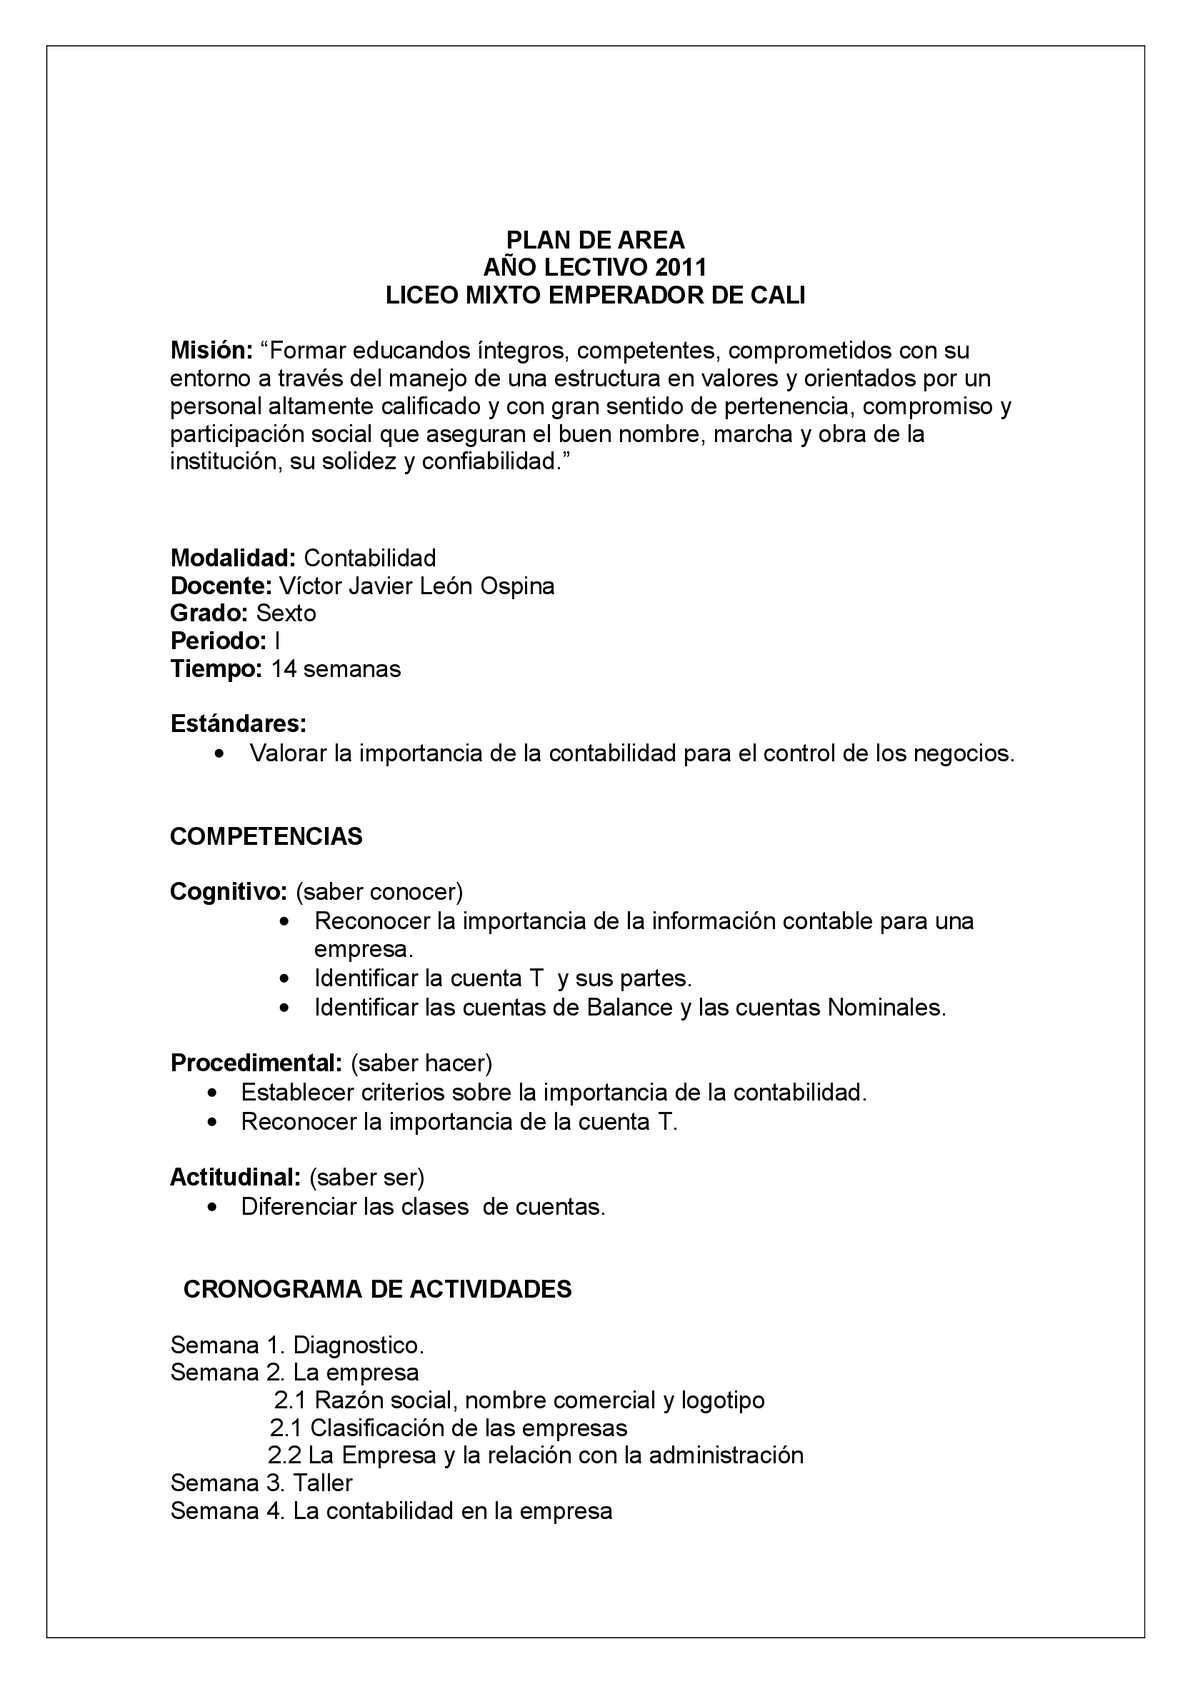 Plan De Area Contable Calameo Downloader